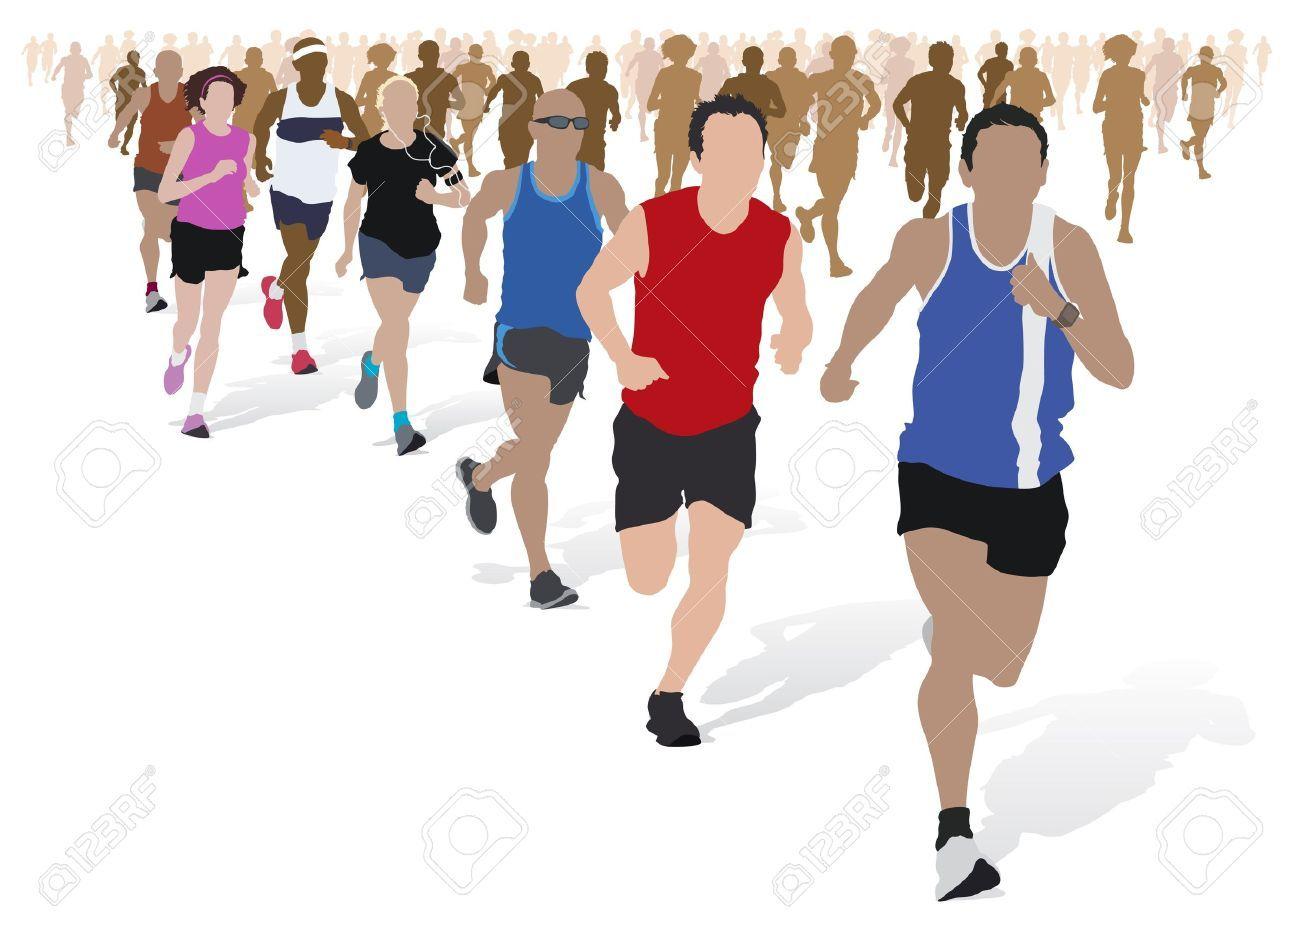 Marathon running clipart image library stock Free marathon clipart 8 » Clipart Portal image library stock